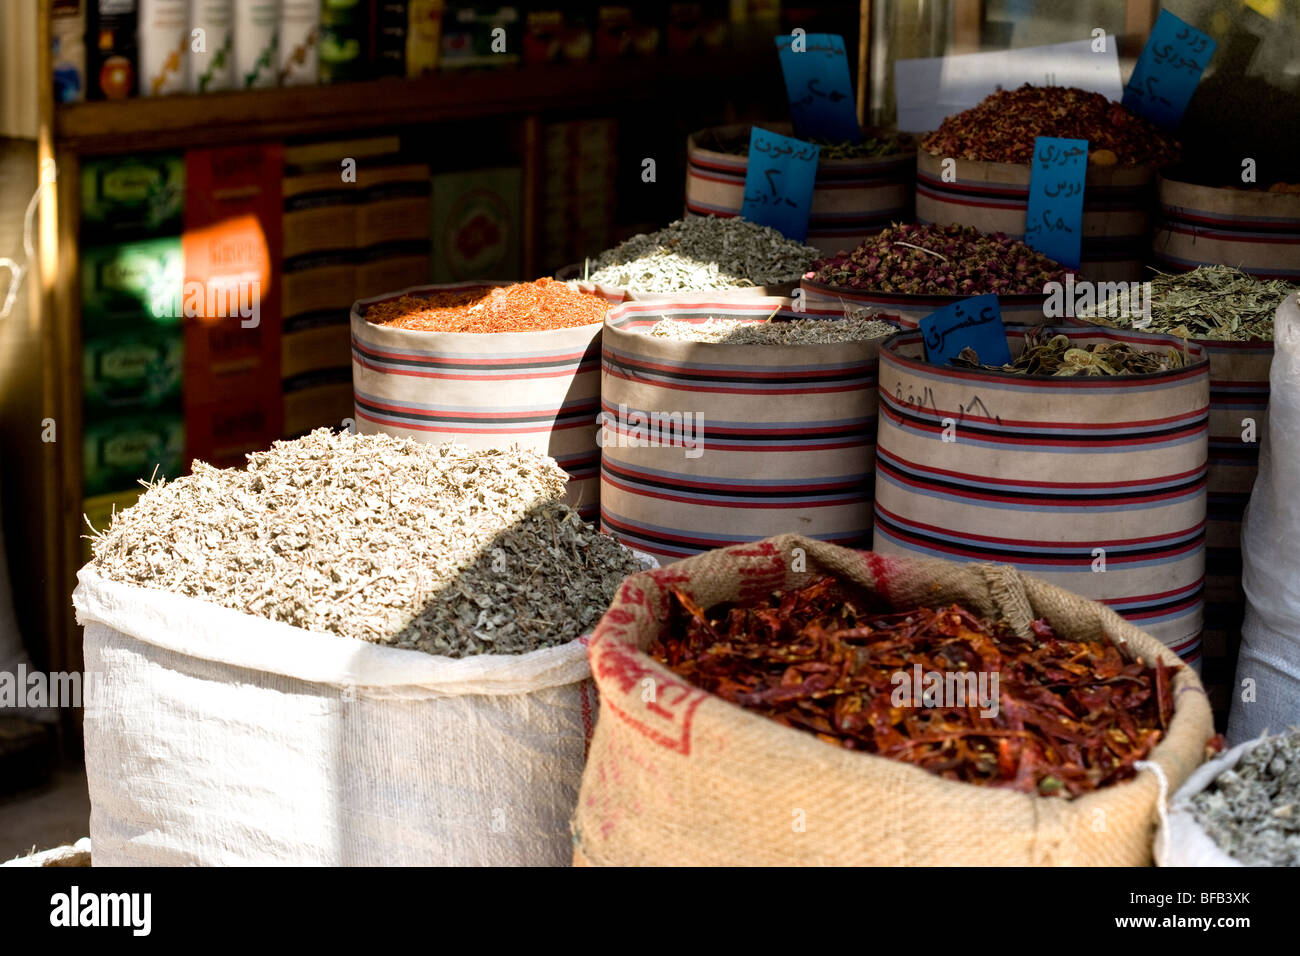 Sacks of spices, Downtown Amman, Jordan - Stock Image